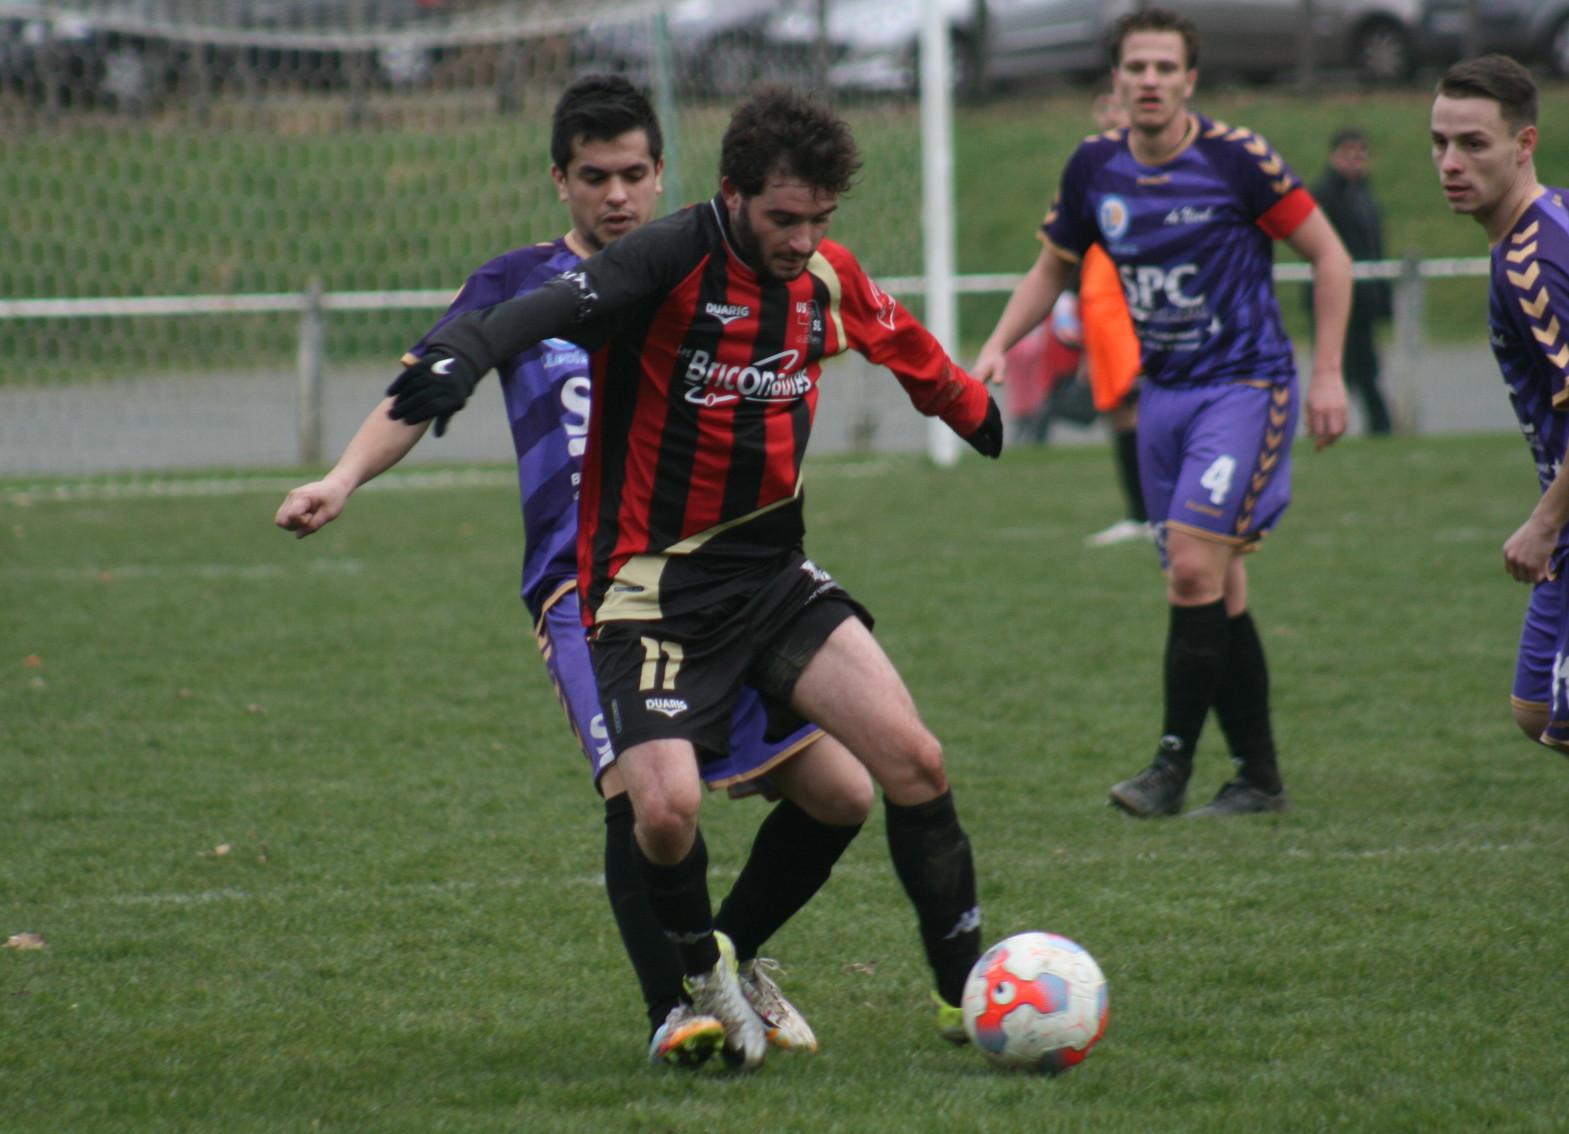 Nieul-St-Léonard (1) Ludovic Rapaud.jpg